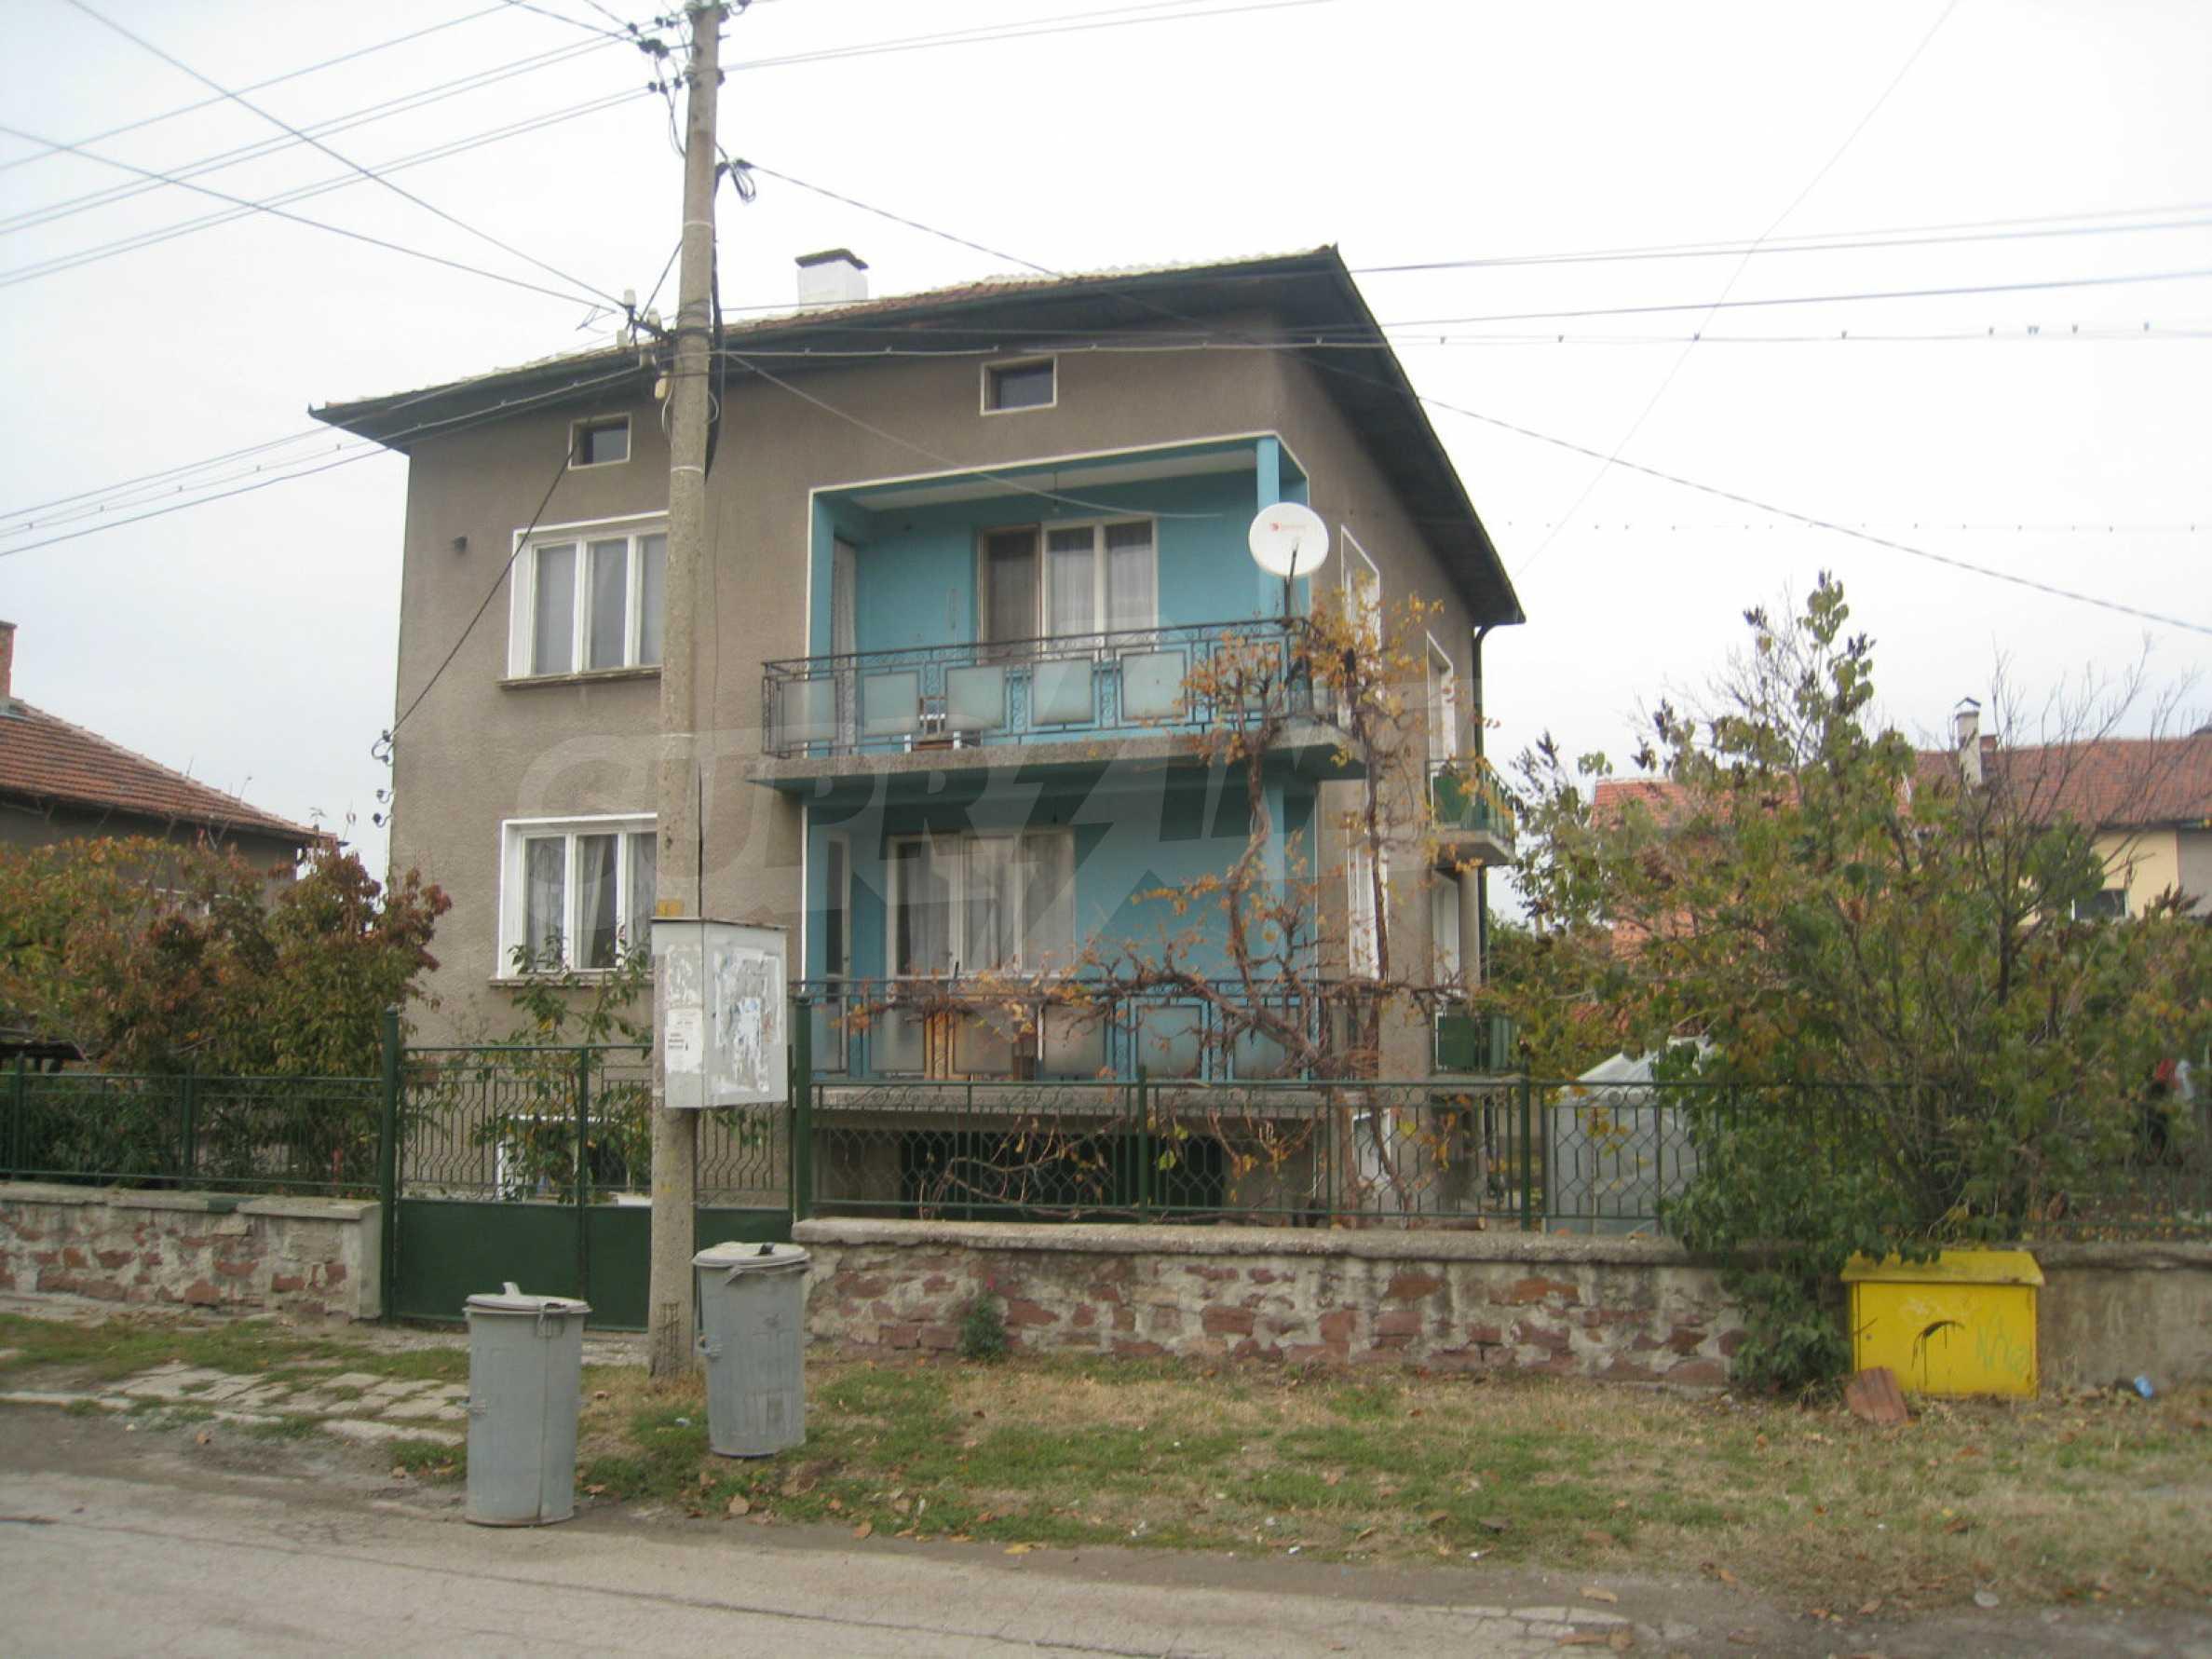 Big 2-storey rural house with garden near Sofia